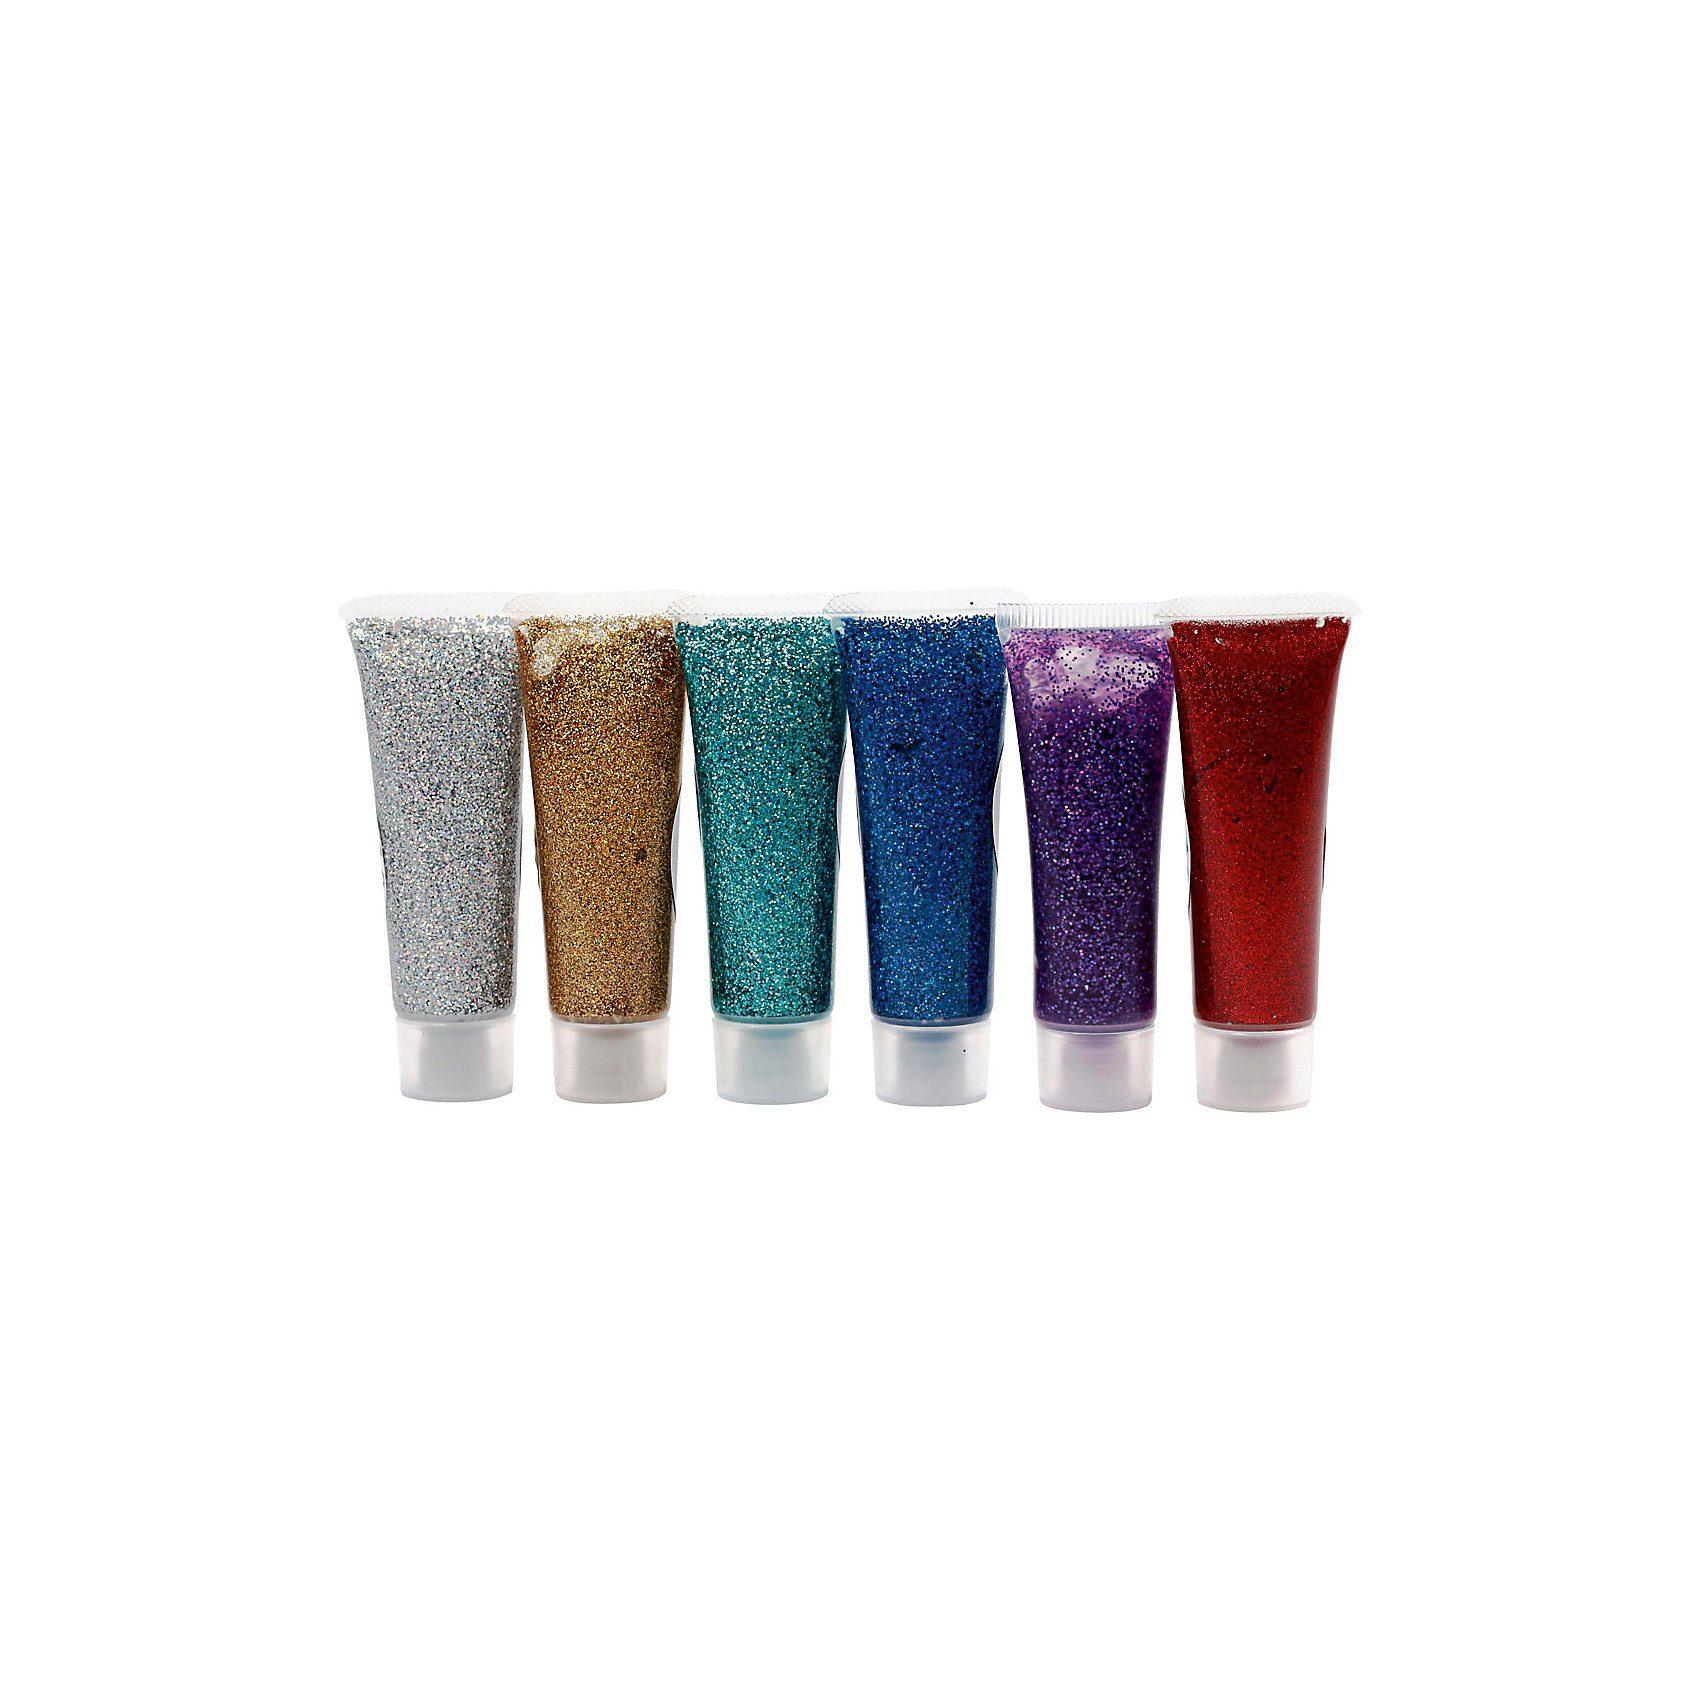 Glitzer-Gel - Sortiment, 6x18 ml, Sortierte Farben